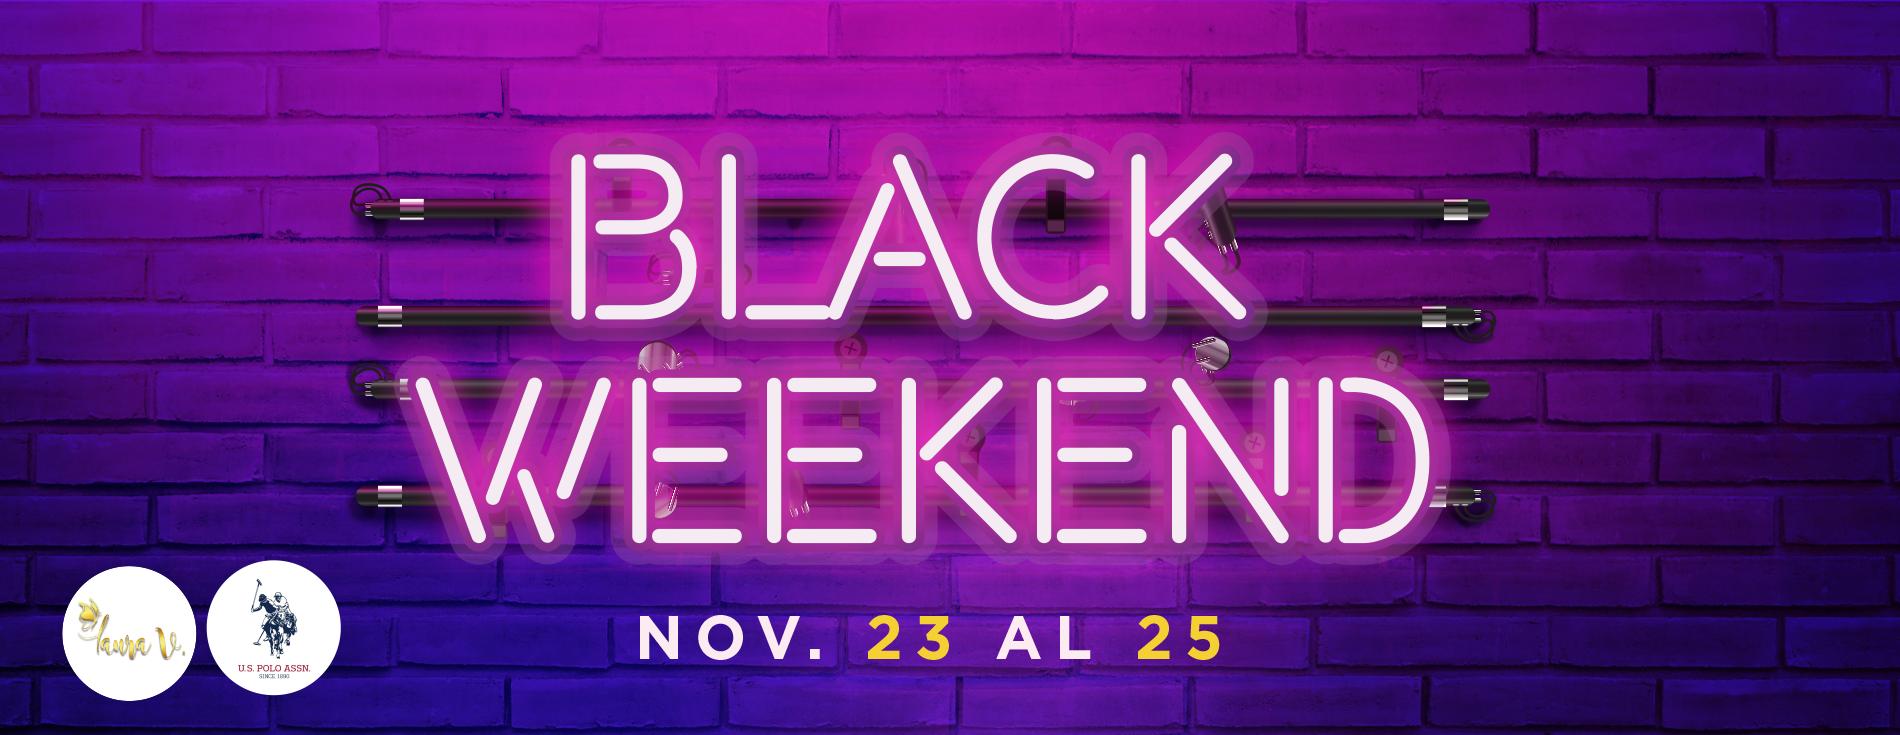 Black Weekend - Wajiira